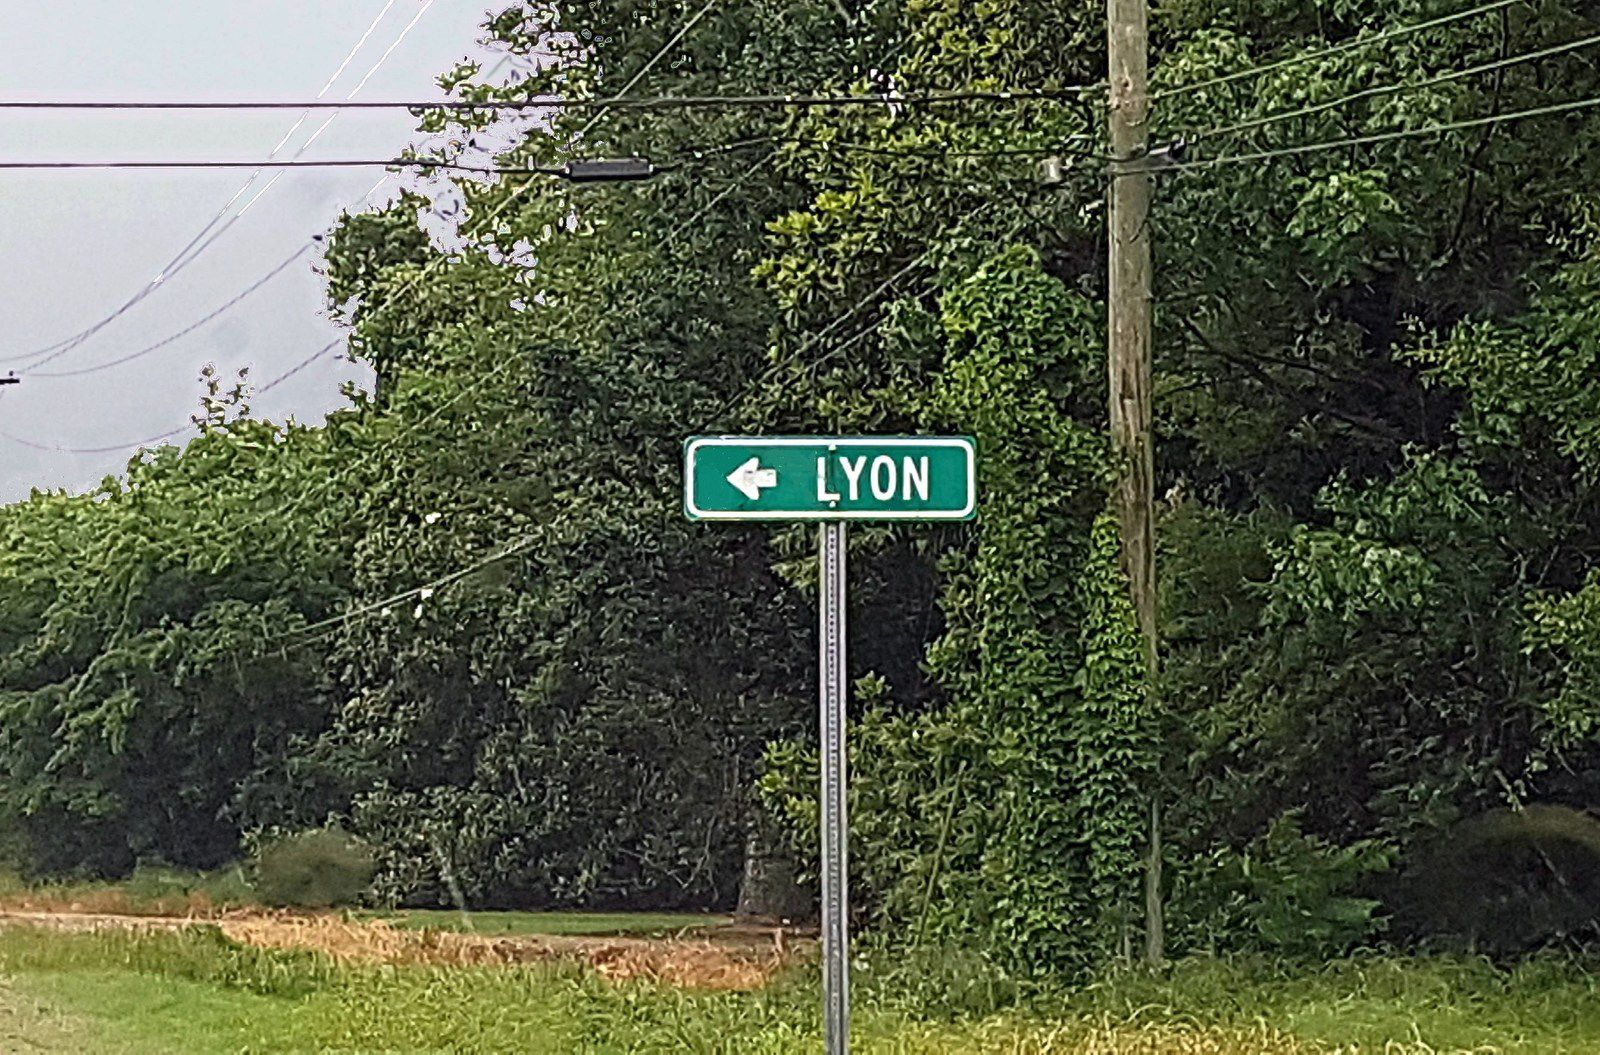 Lyon, Mississippi